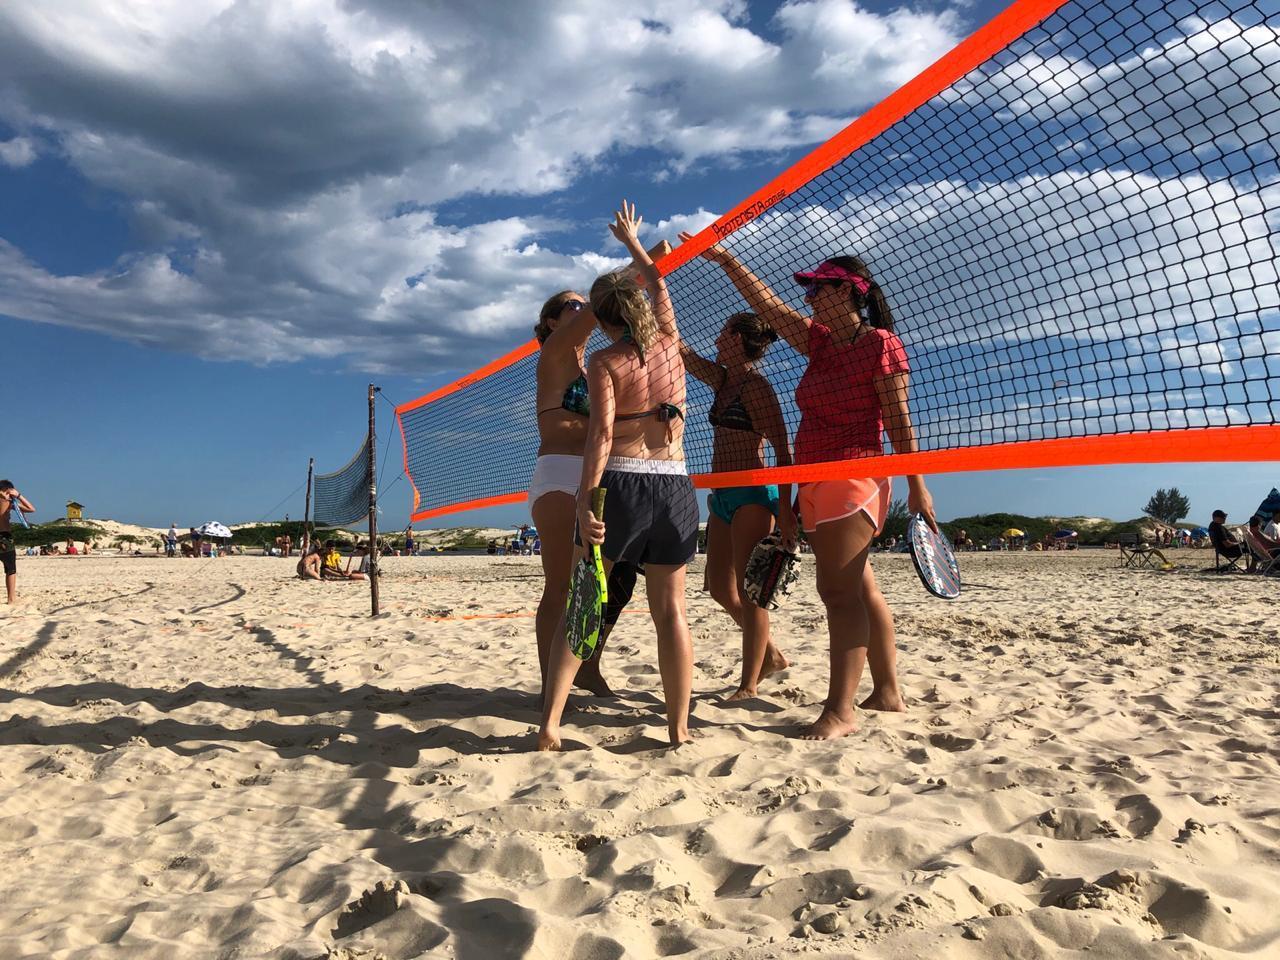 Rede Oficial Beach Tennis ProTenista - 4 Lados - Laranja   - PROTENISTA